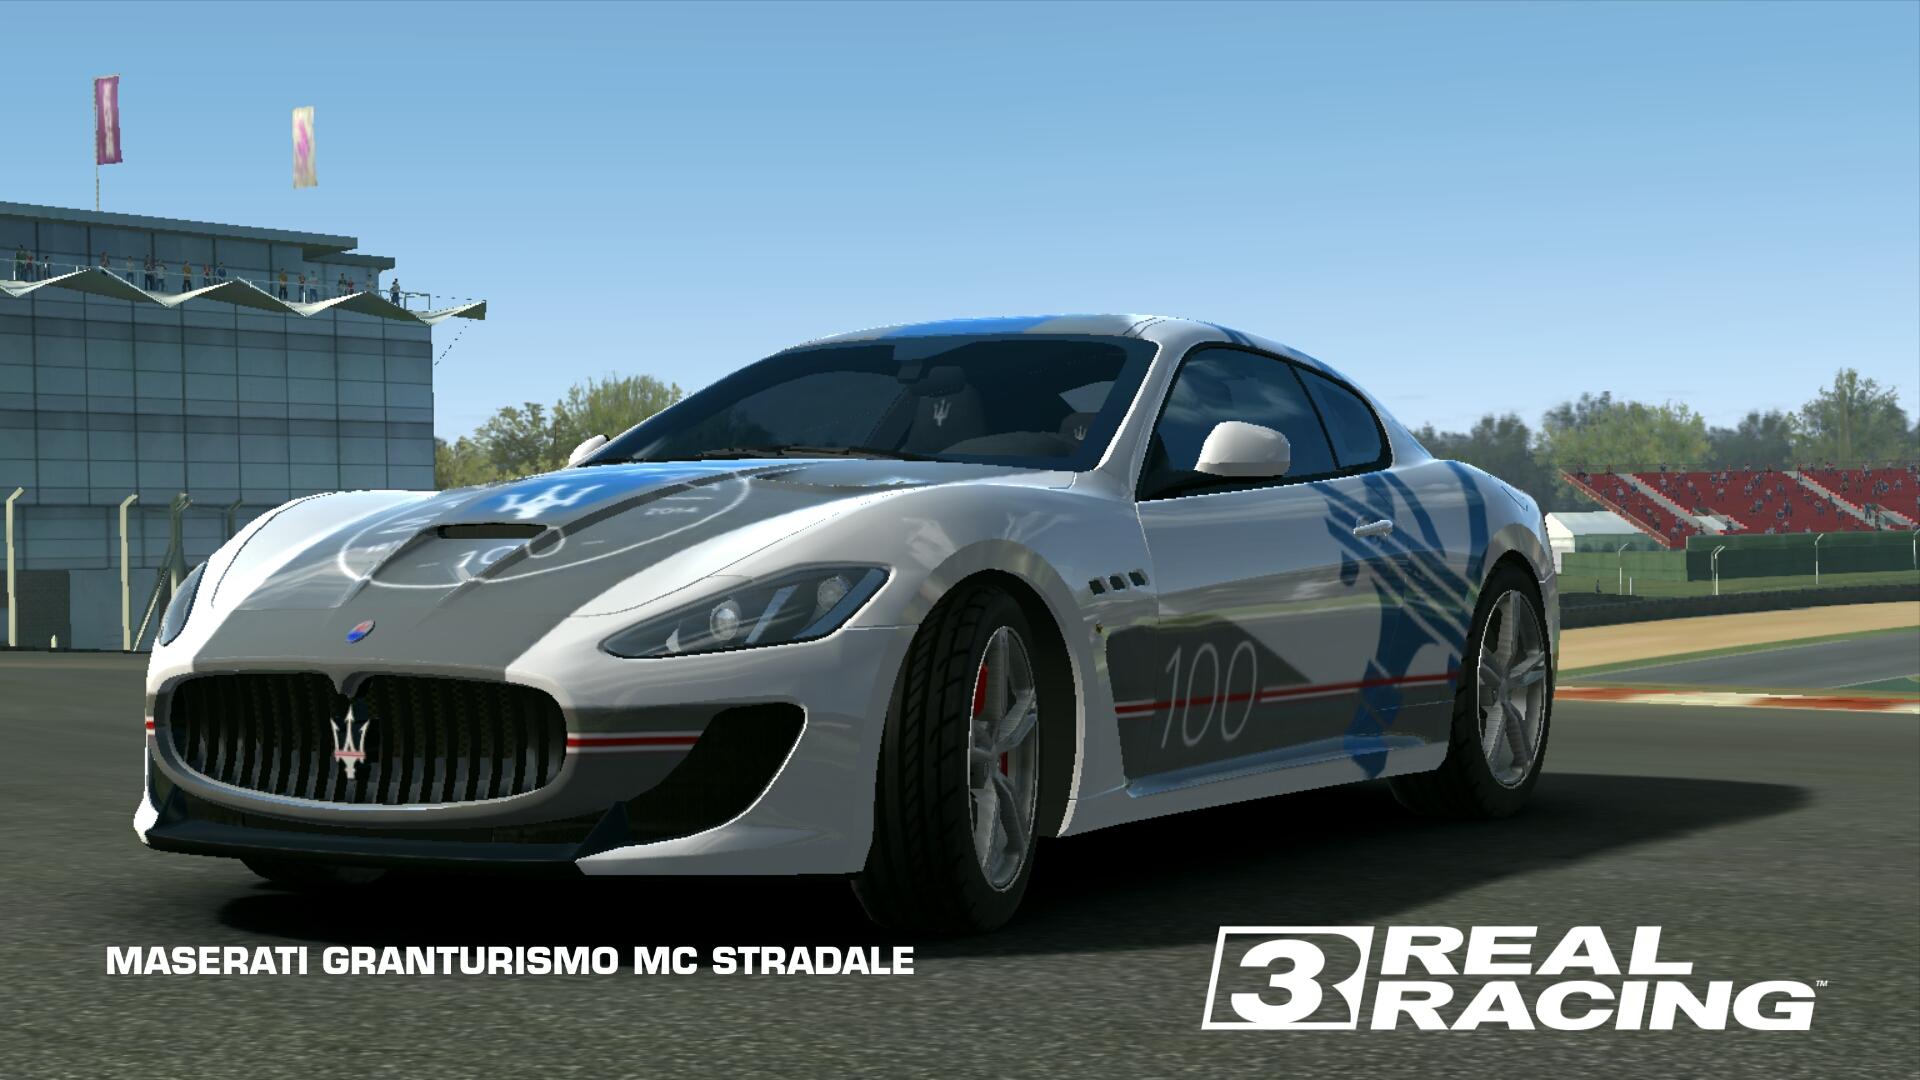 maserati granturismo mc stradale | real racing 3 wiki | fandom